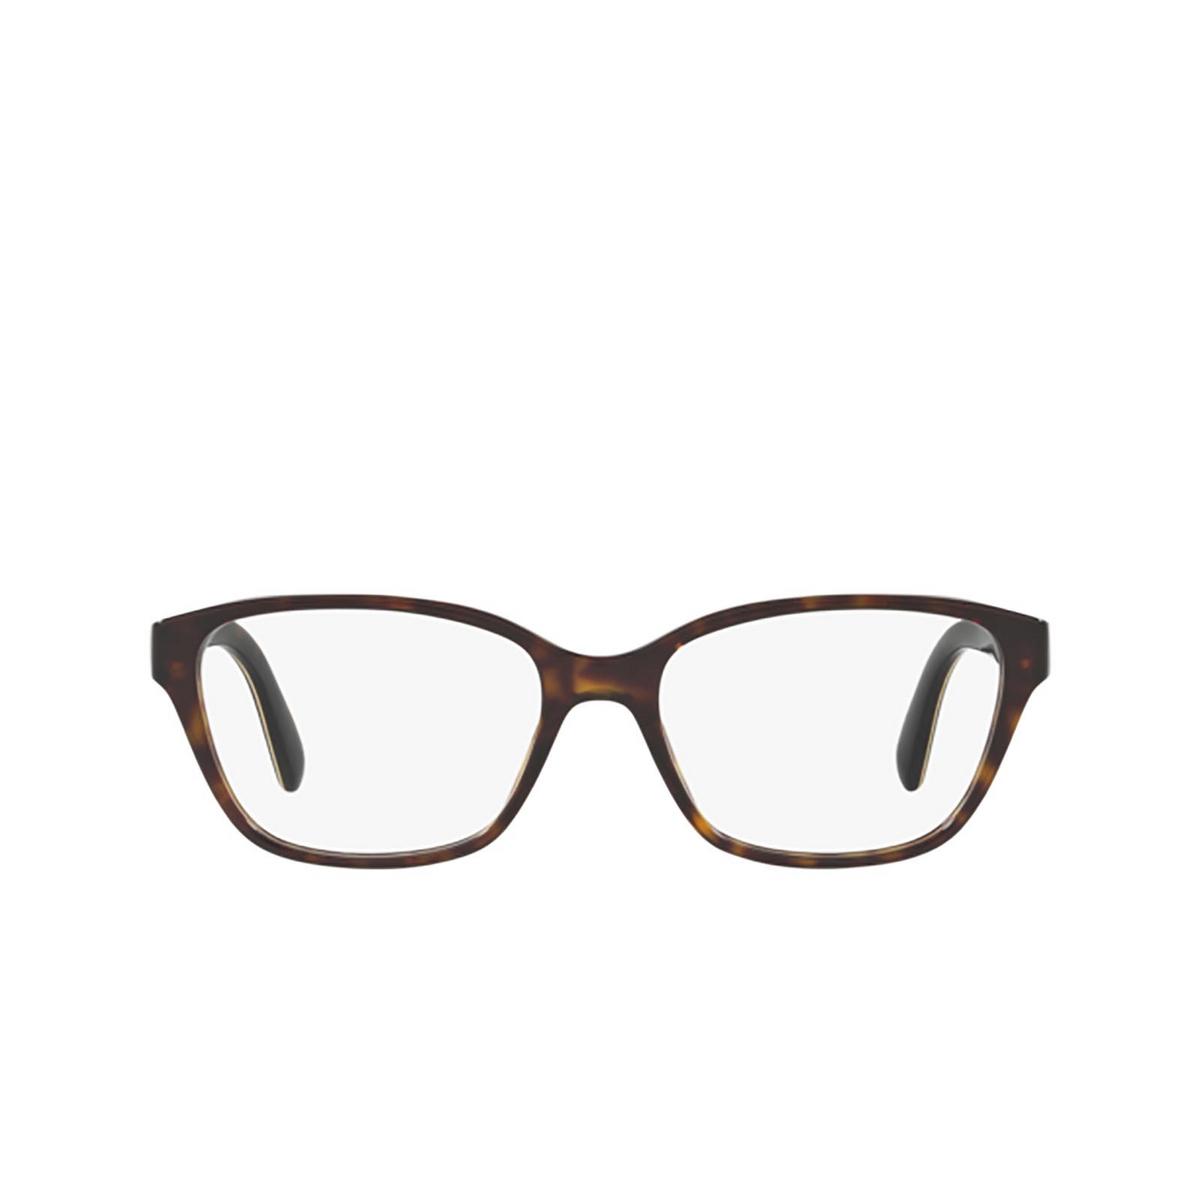 Polo Ralph Lauren® Rectangle Eyeglasses: PH2165 color Dark Havana 5003.